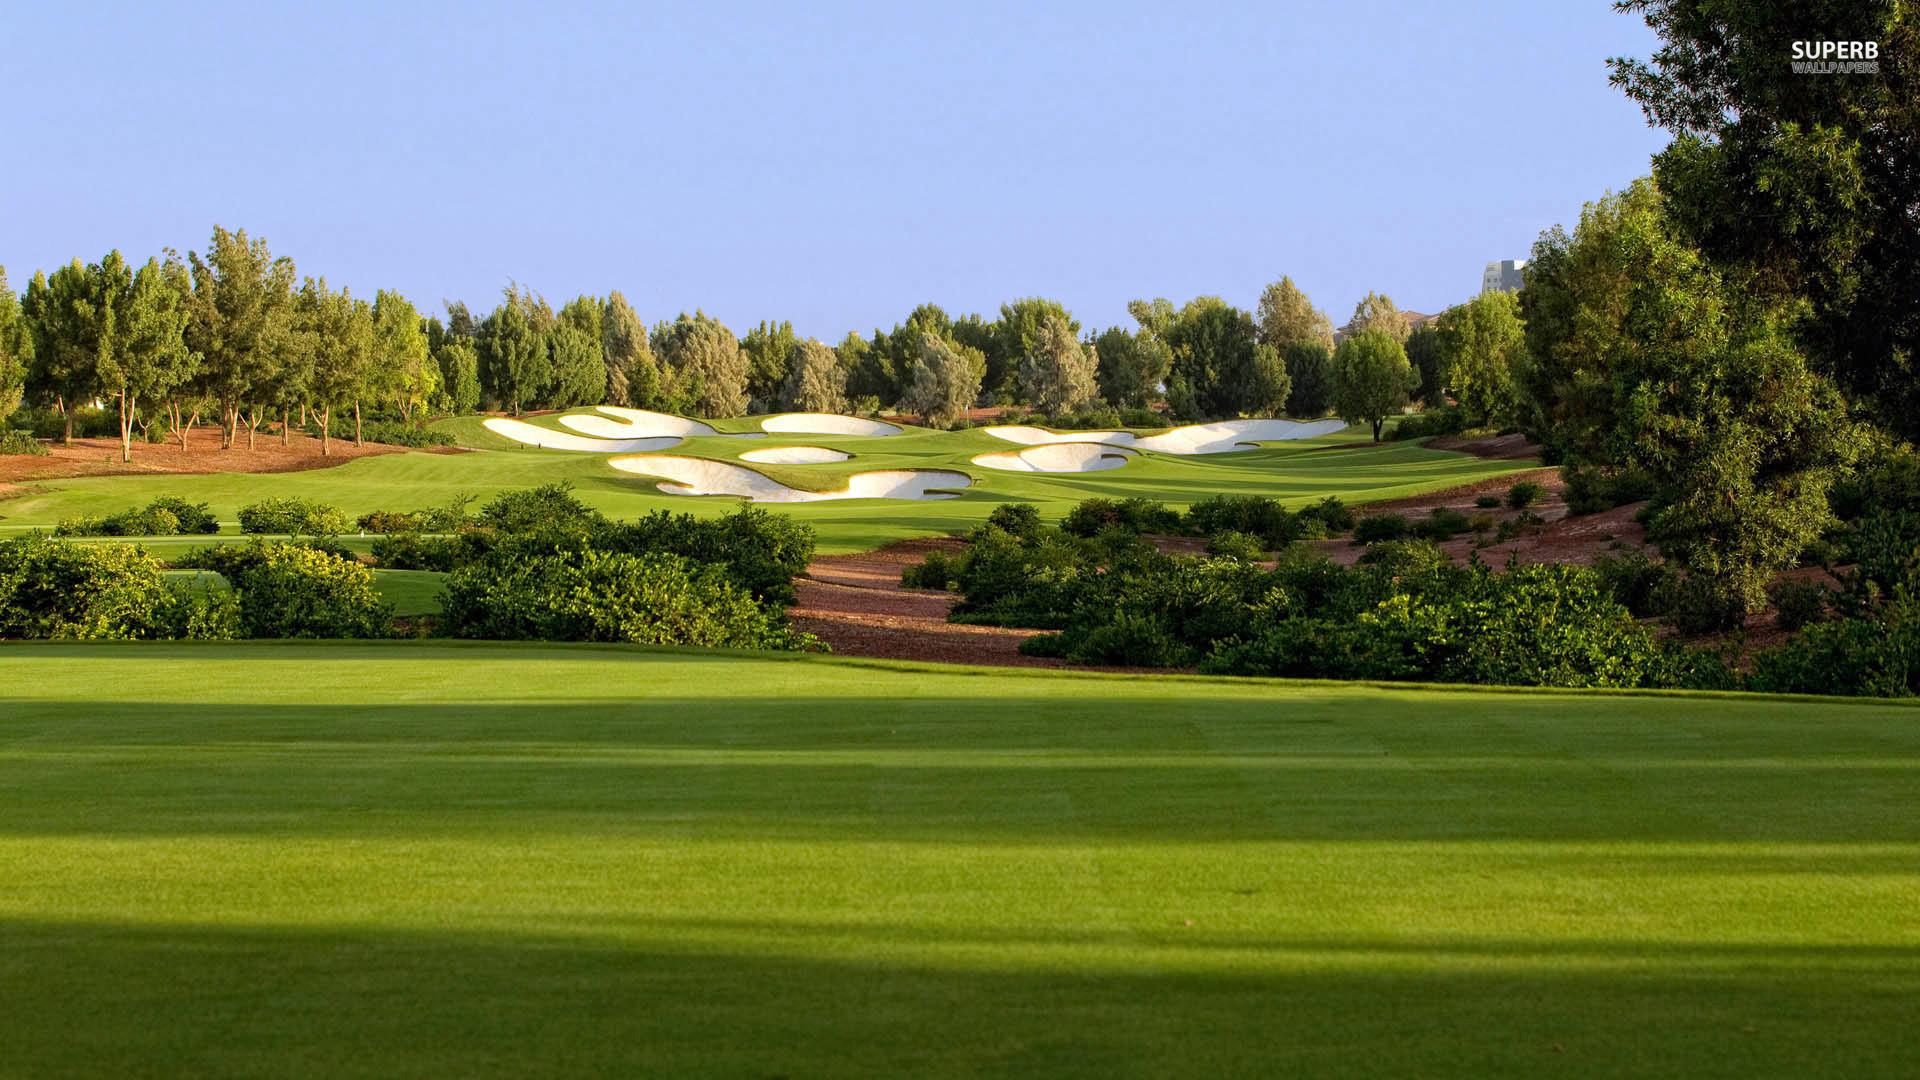 Download Jumeirah Golf Estates HD Wallpaper